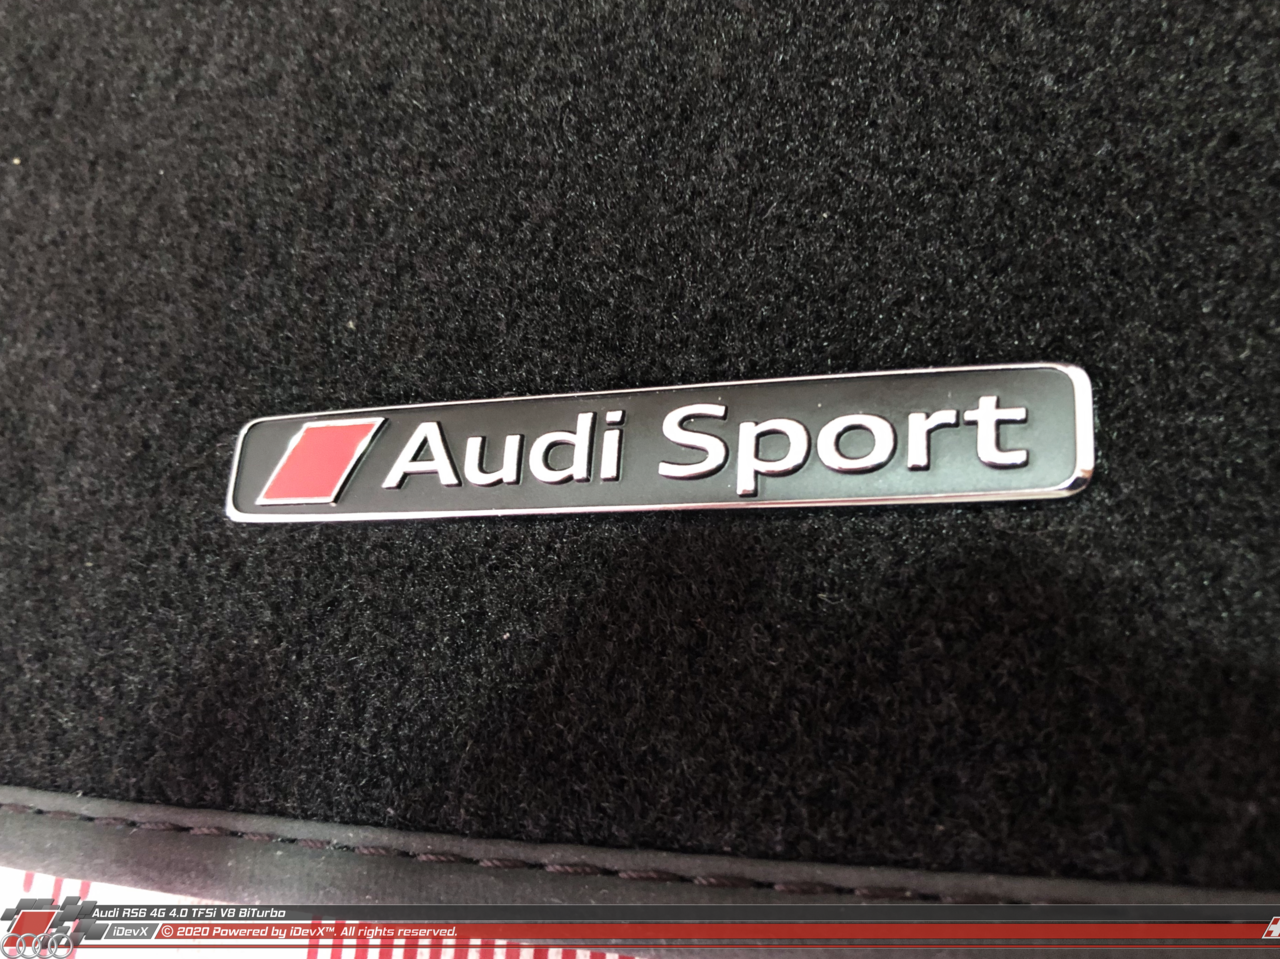 15_08.2019_Audi-RS6_iDevX_009.png